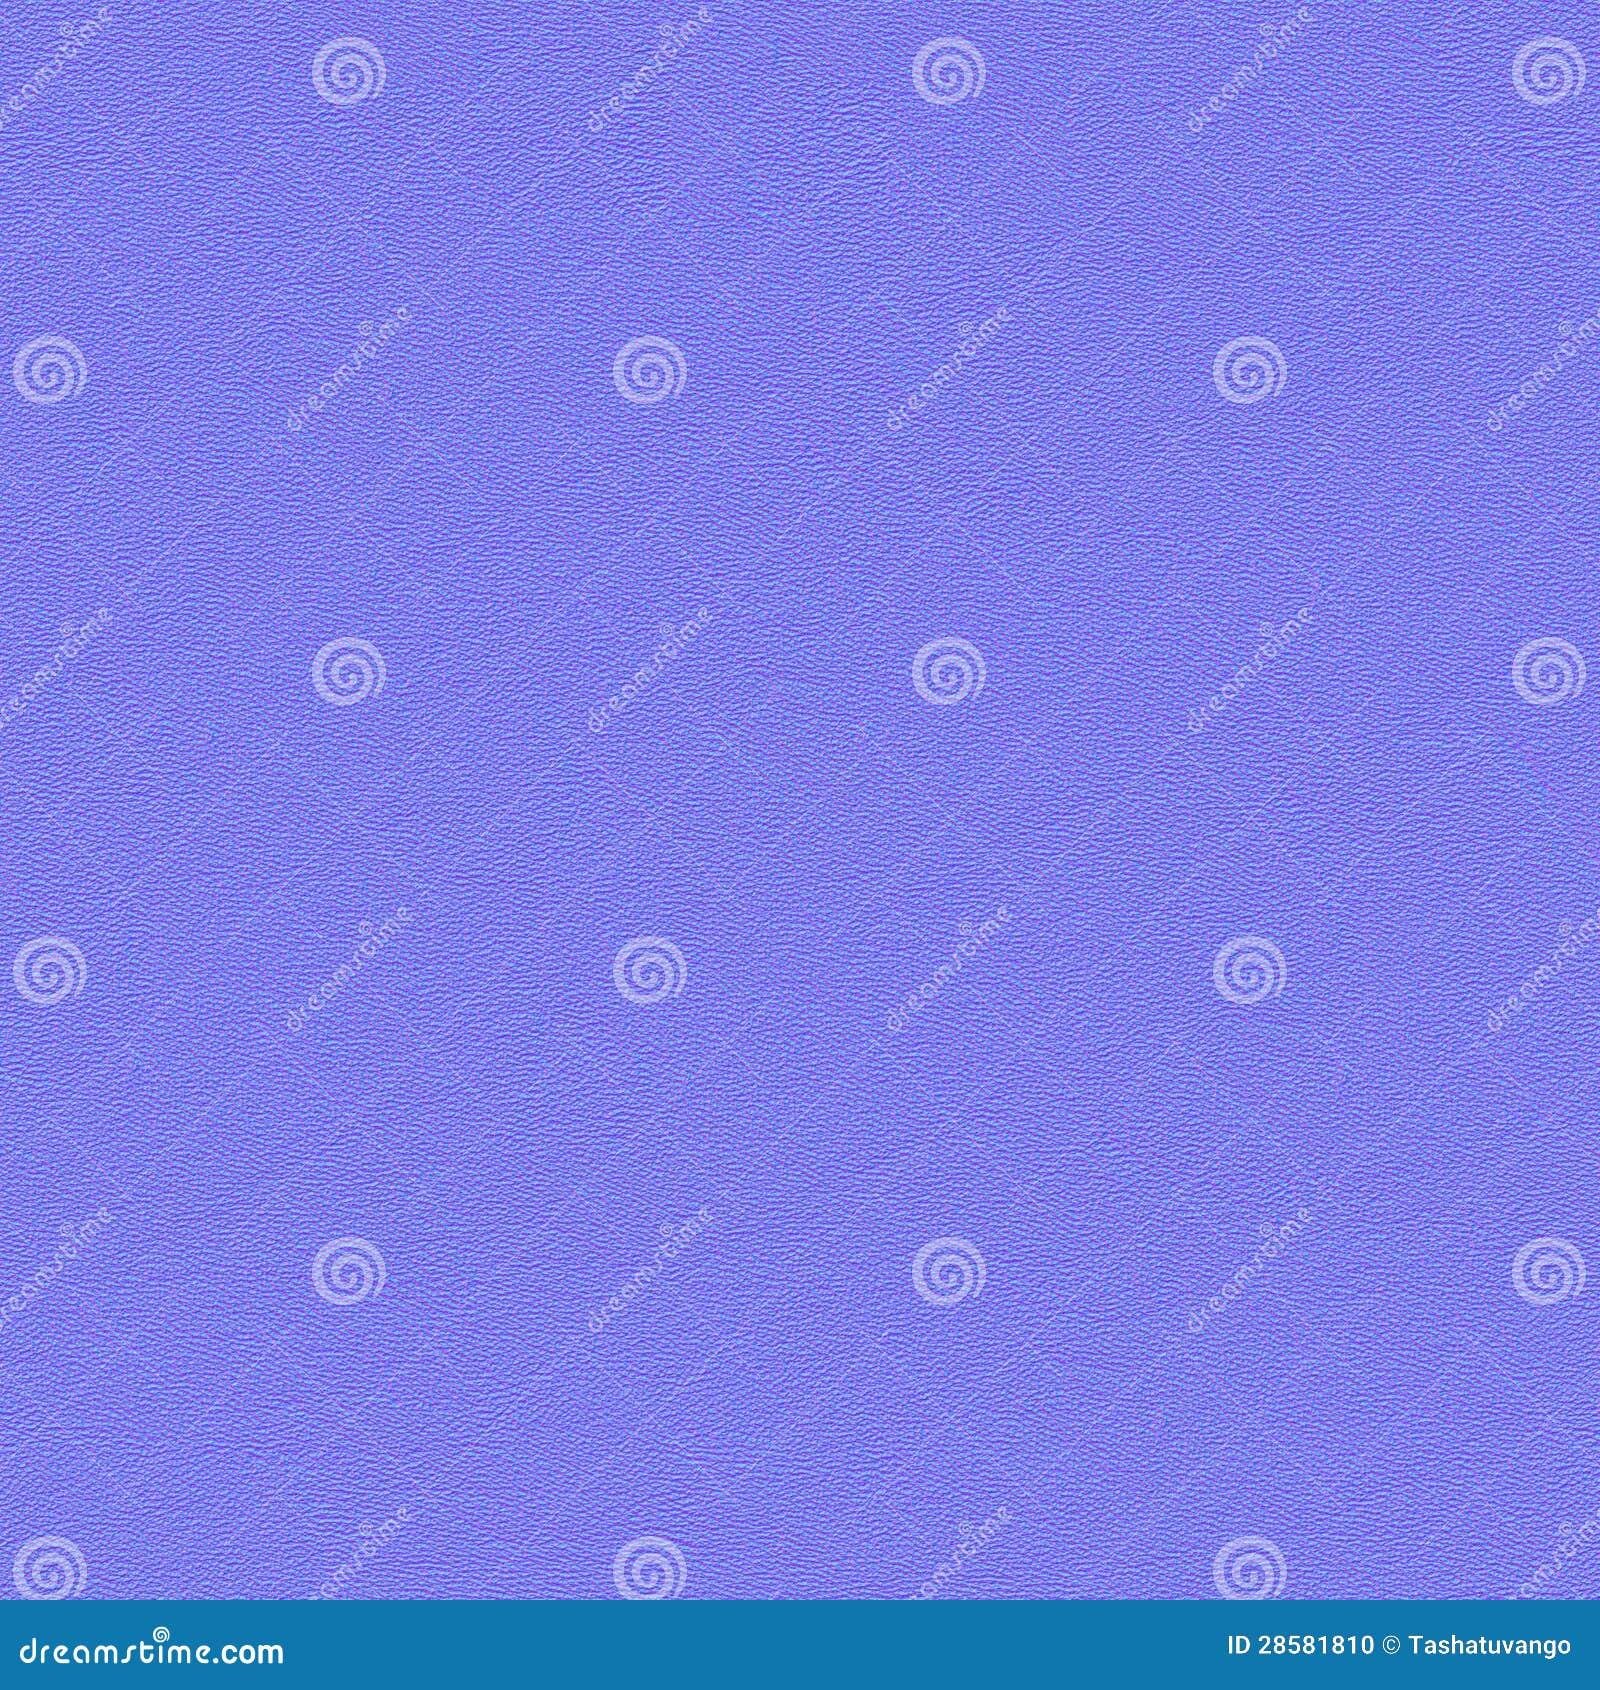 minus et cortex image s39k